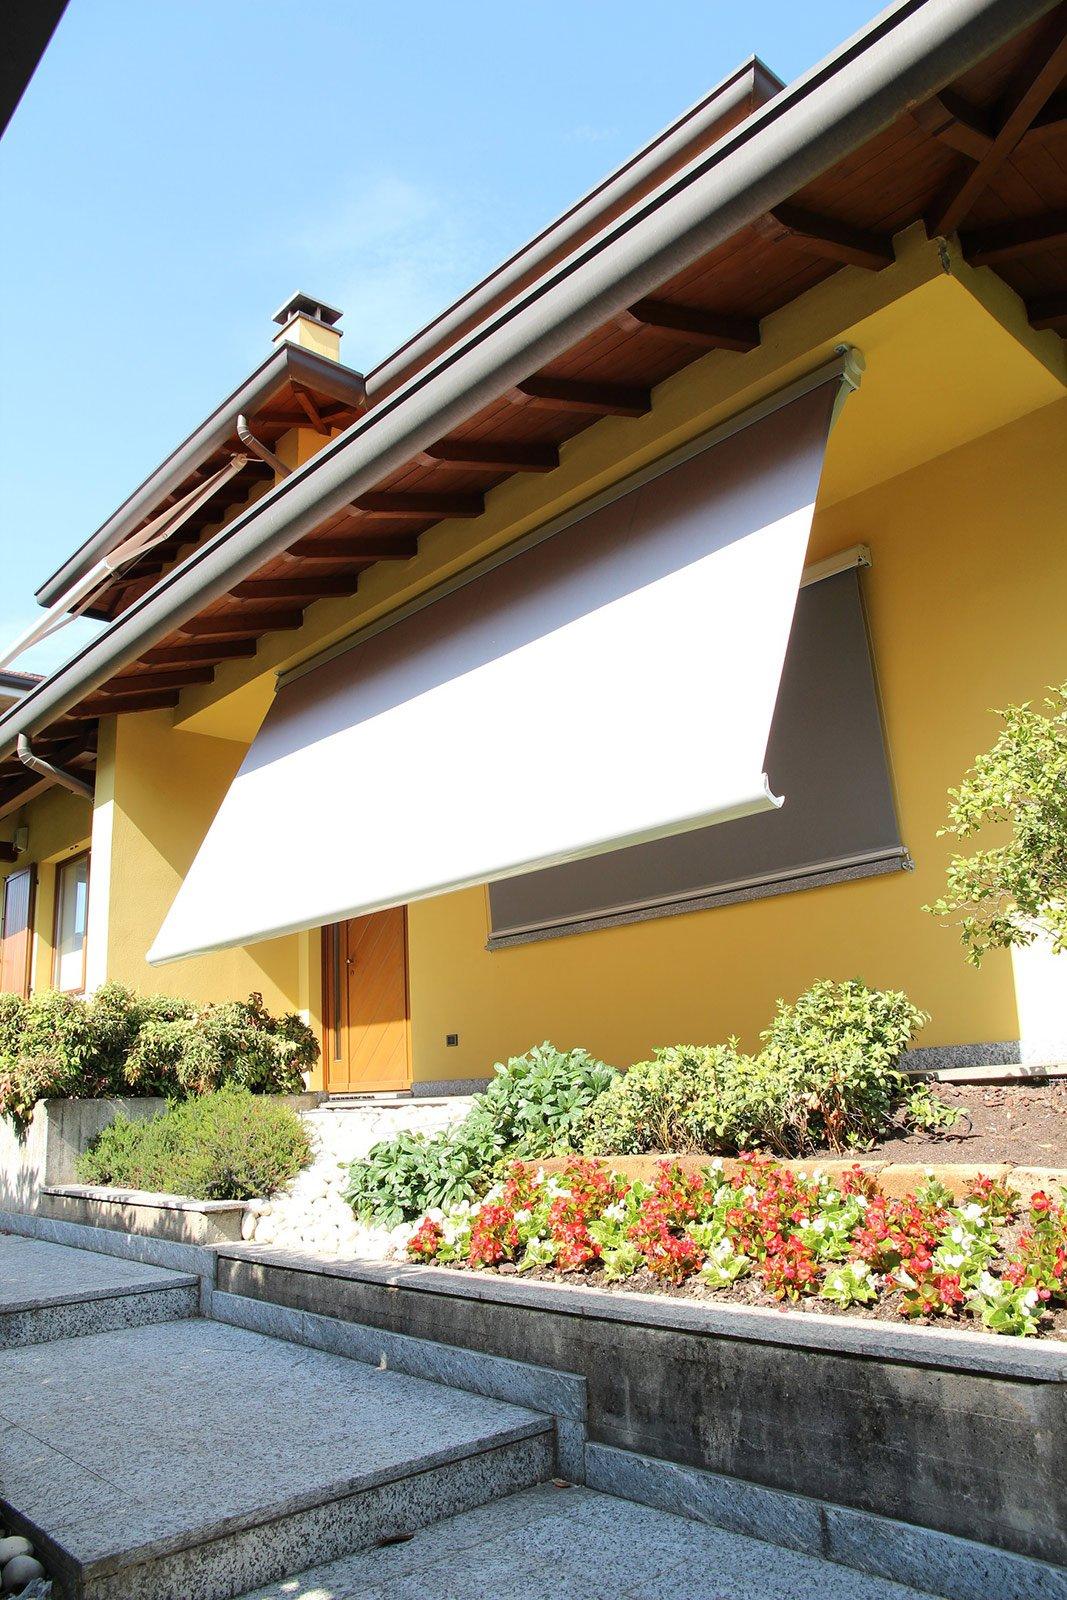 Tende da sole per terrazzo o giardino cose di casa - Ikea tende da giardino ...